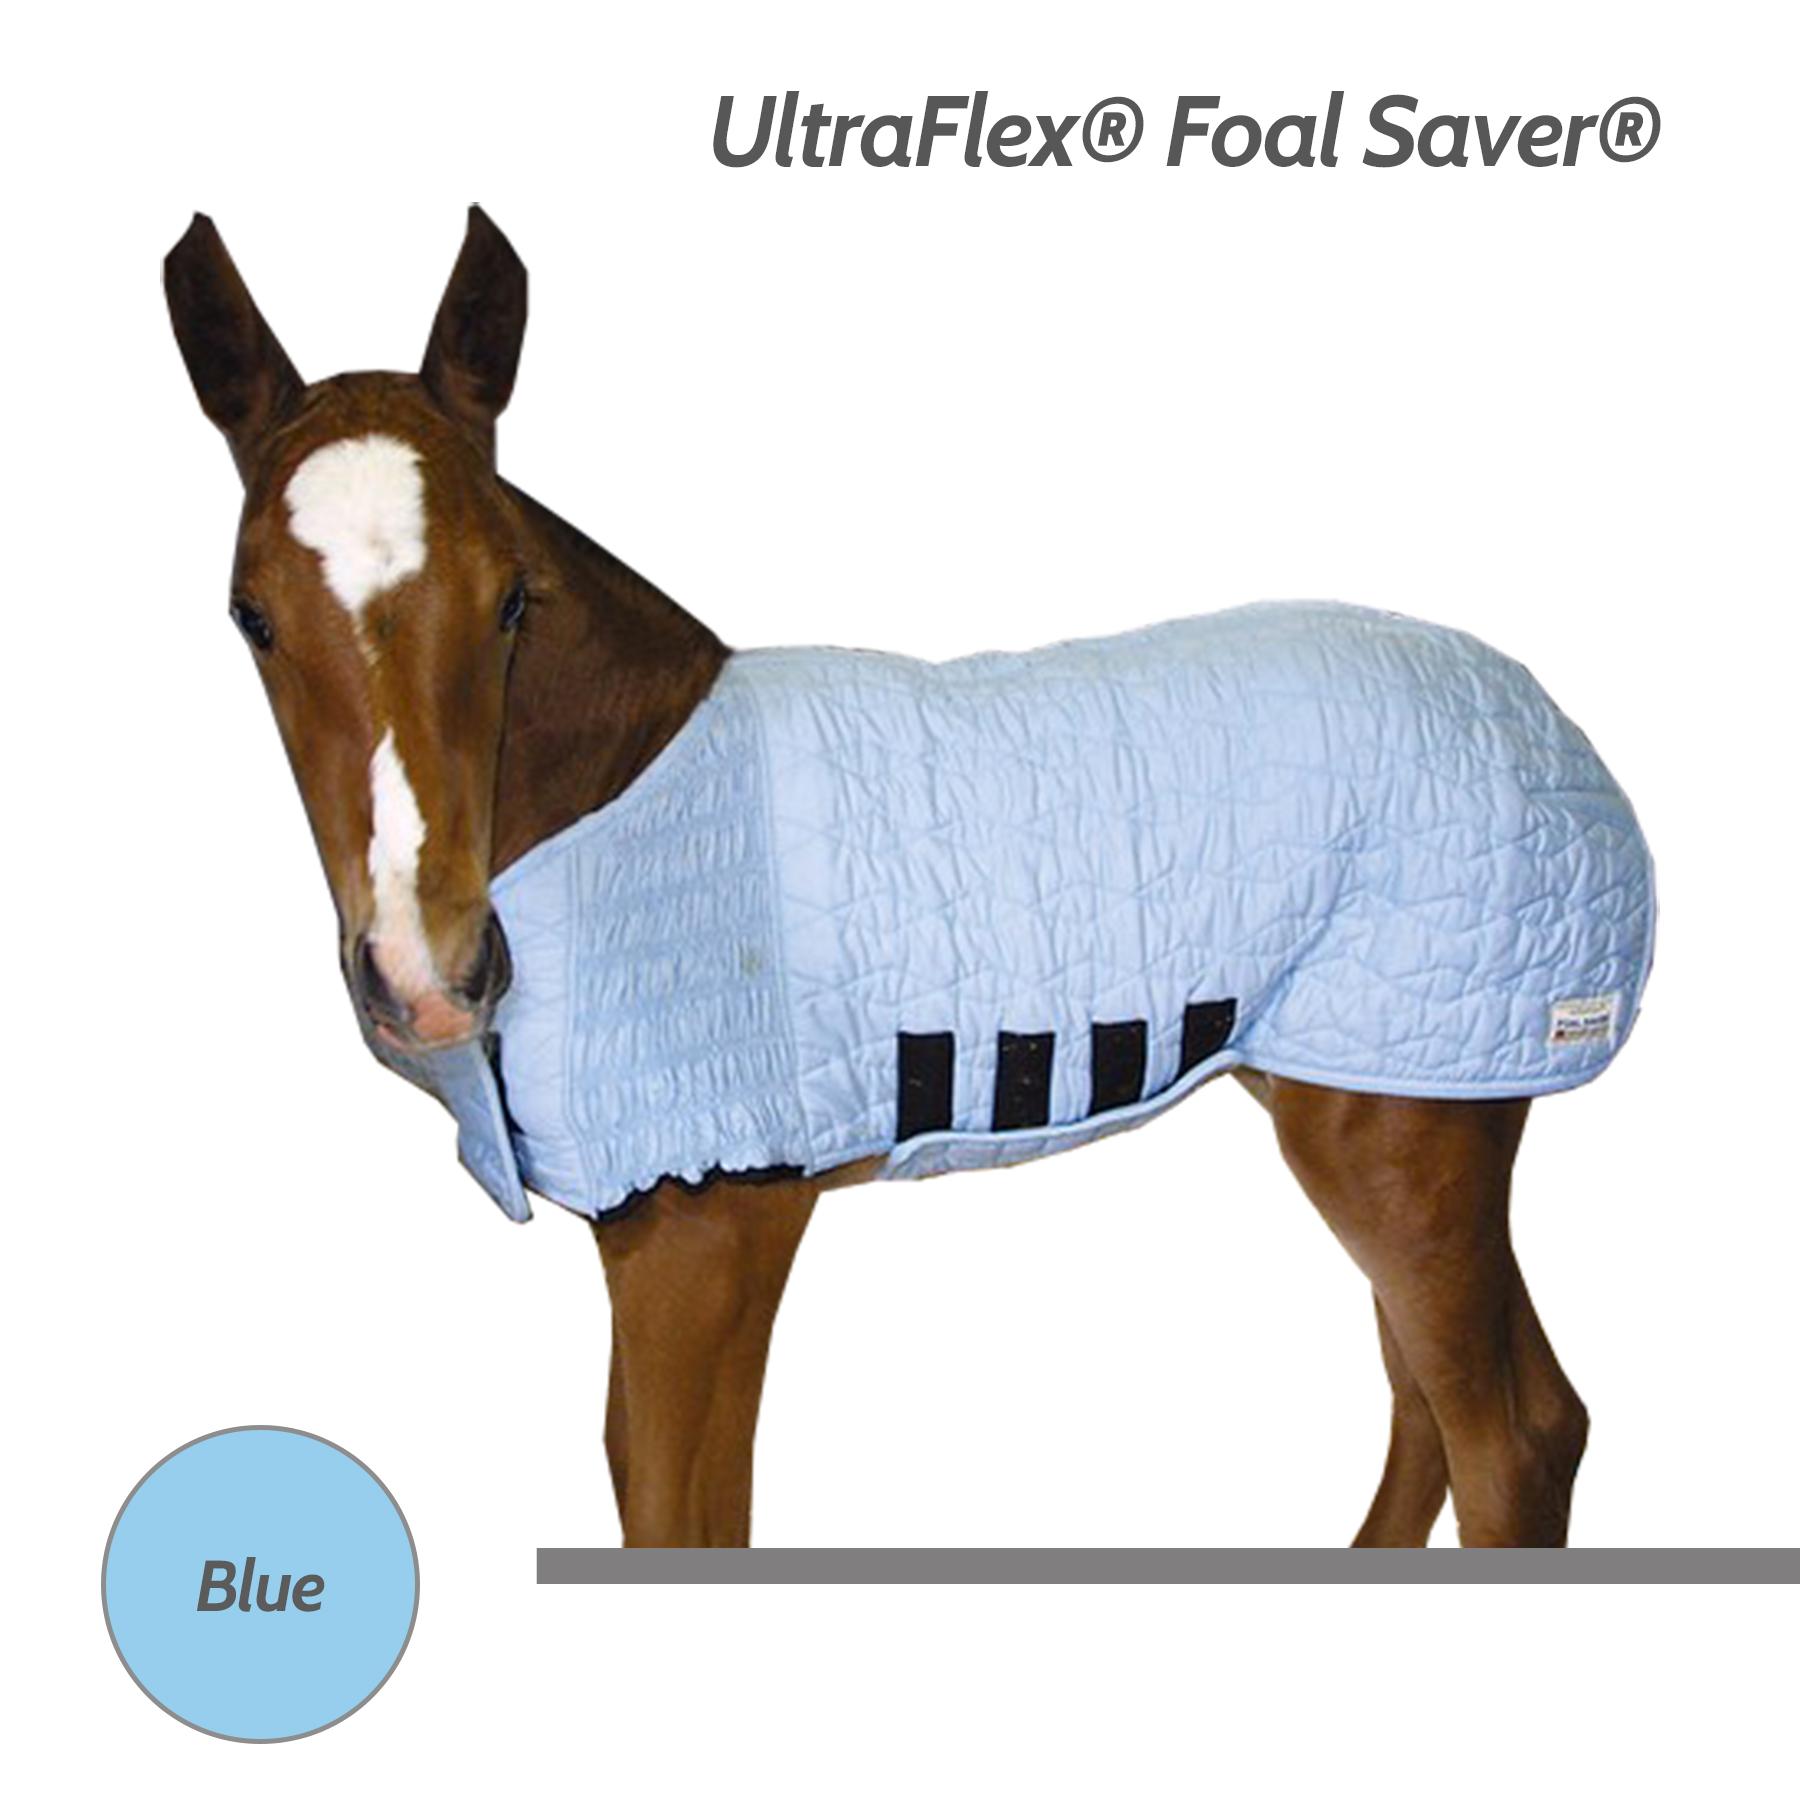 ai07728-UltraFlex®-Foal-Saver-XLarge